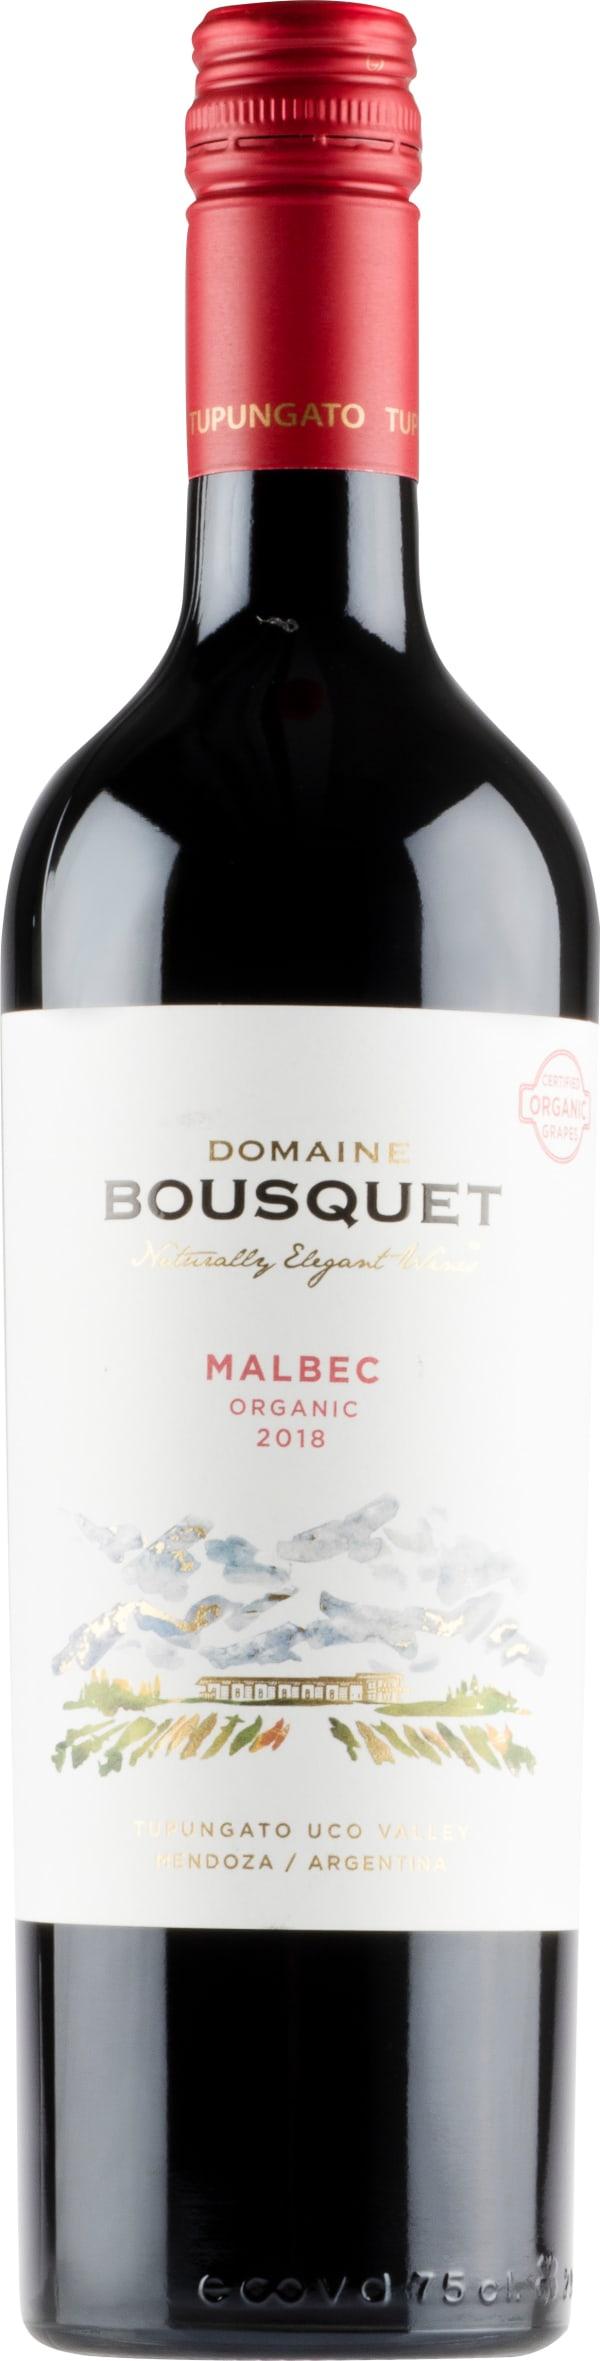 Domaine Bousquet Malbec Organic 2018